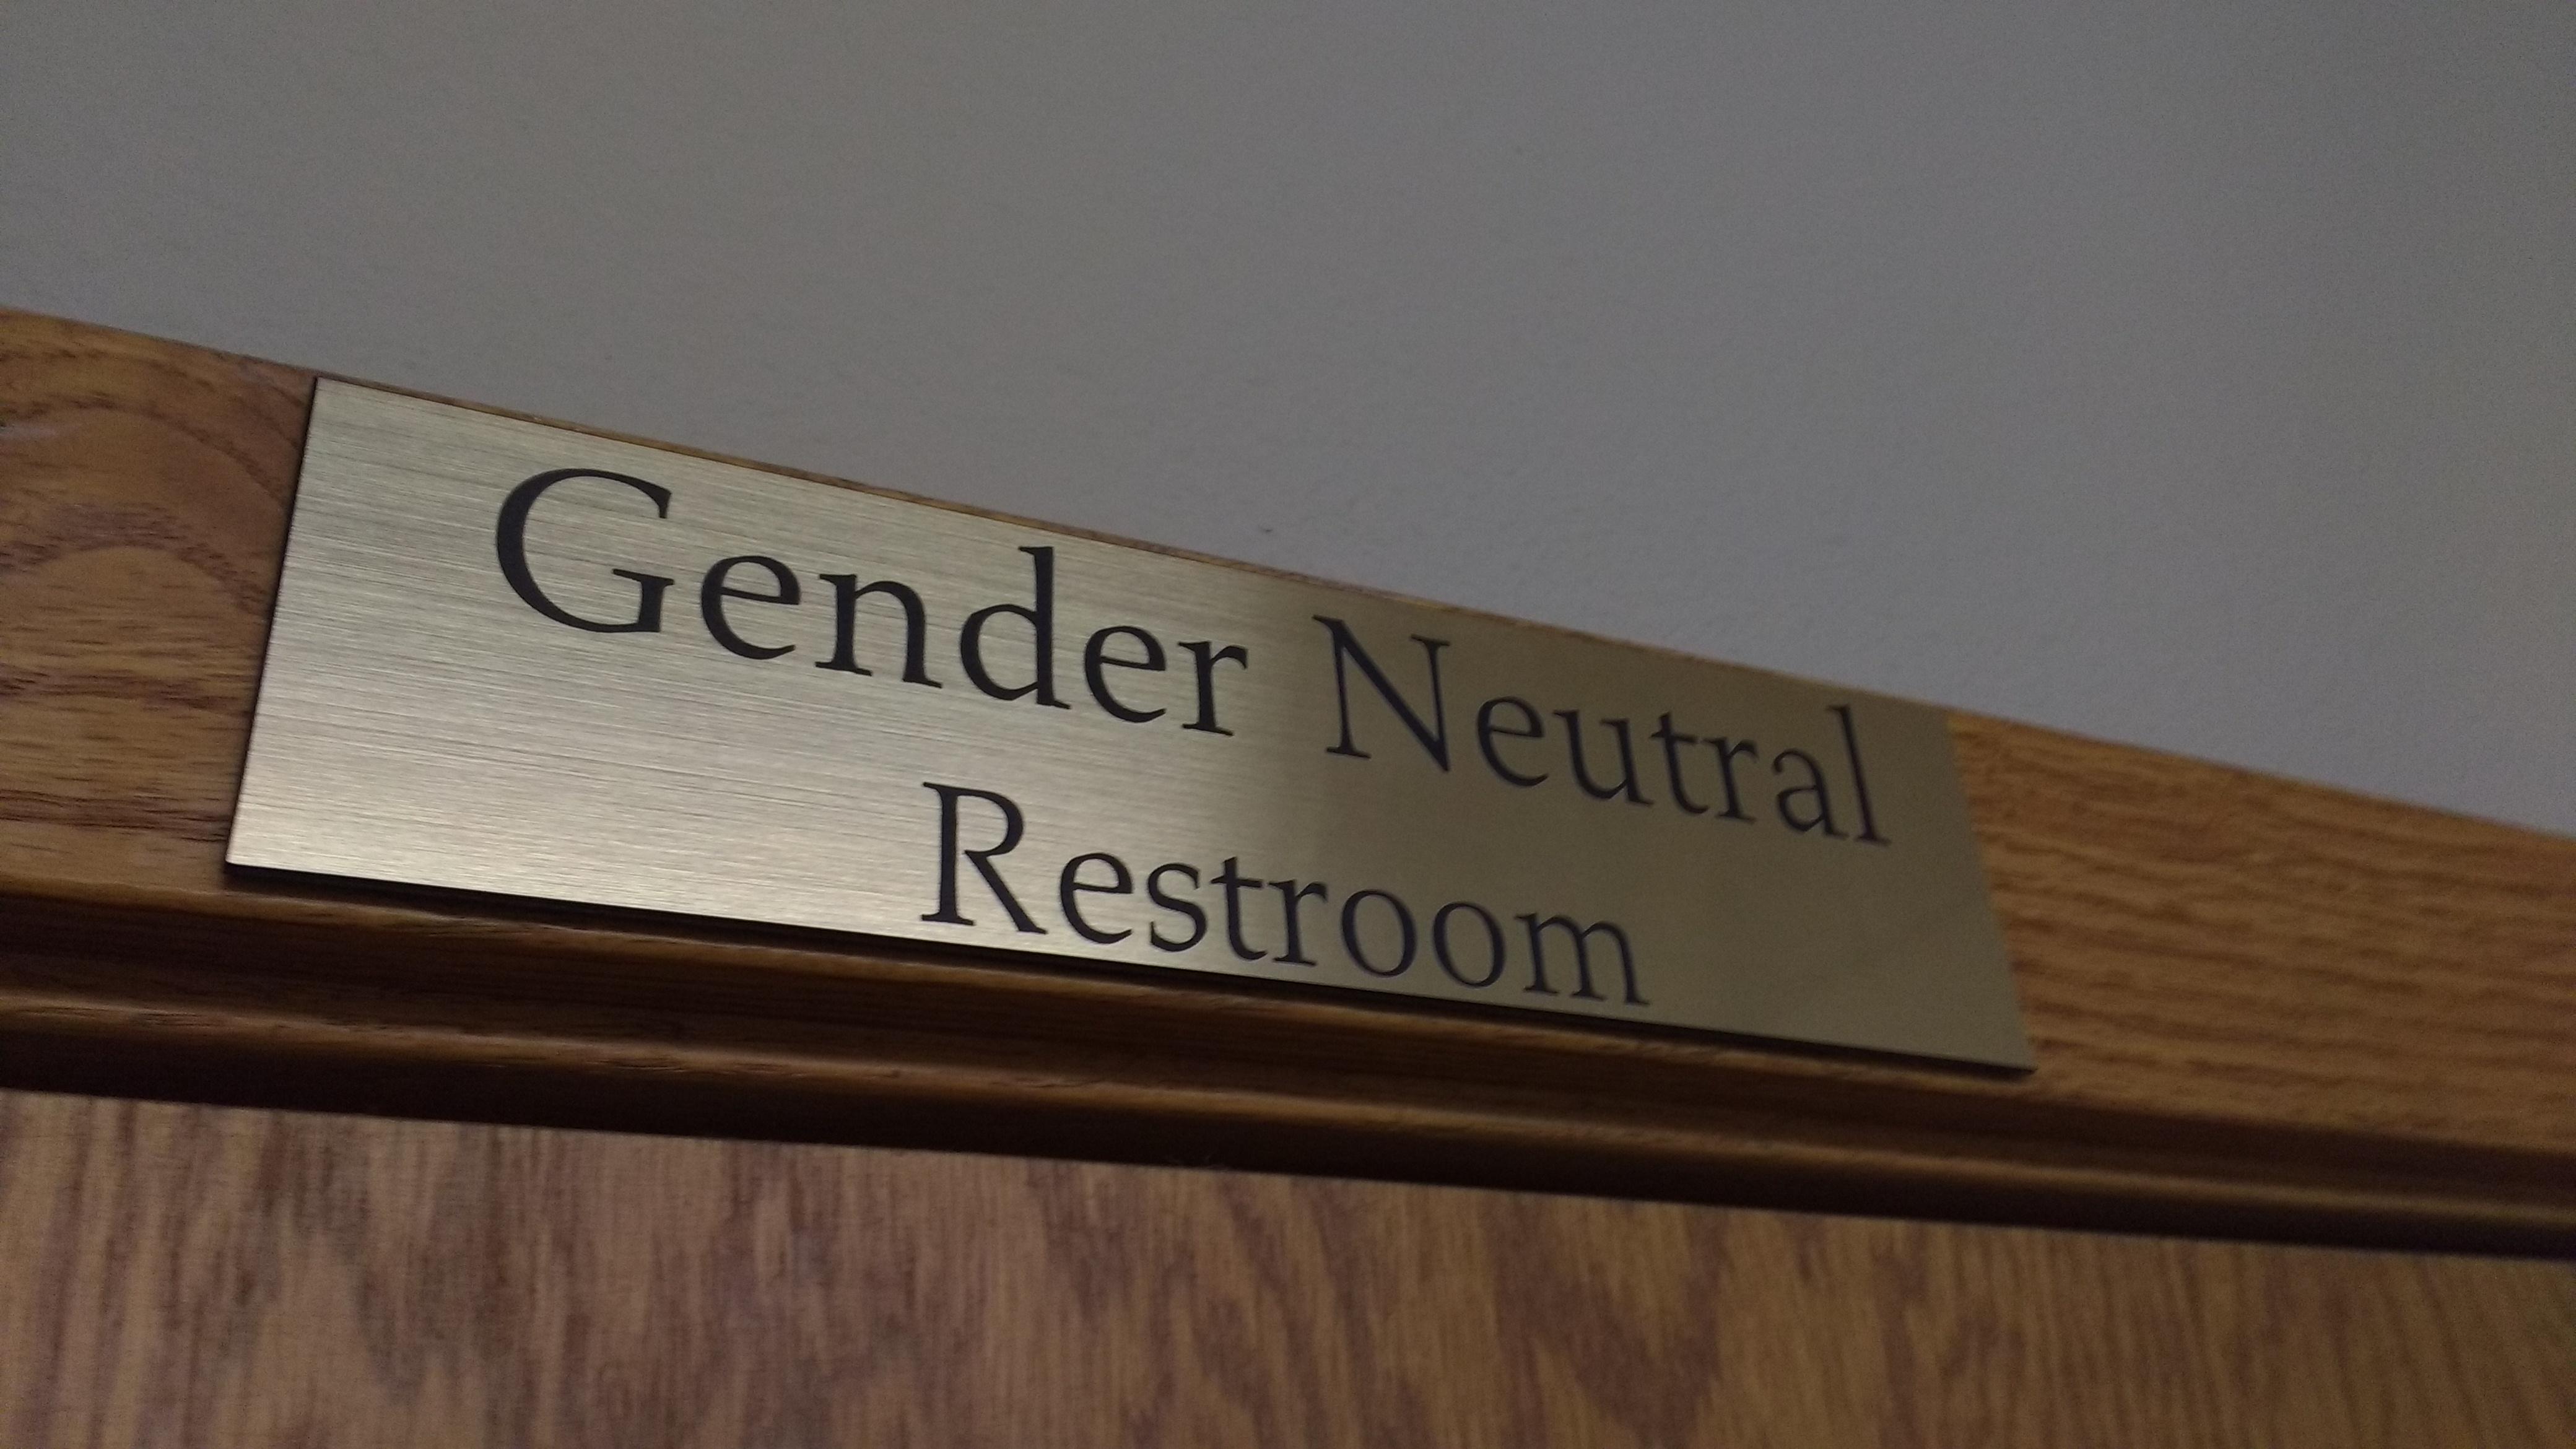 Fantastic Gender Neutral Restroom Debate Continues In Nations Schools Download Free Architecture Designs Scobabritishbridgeorg